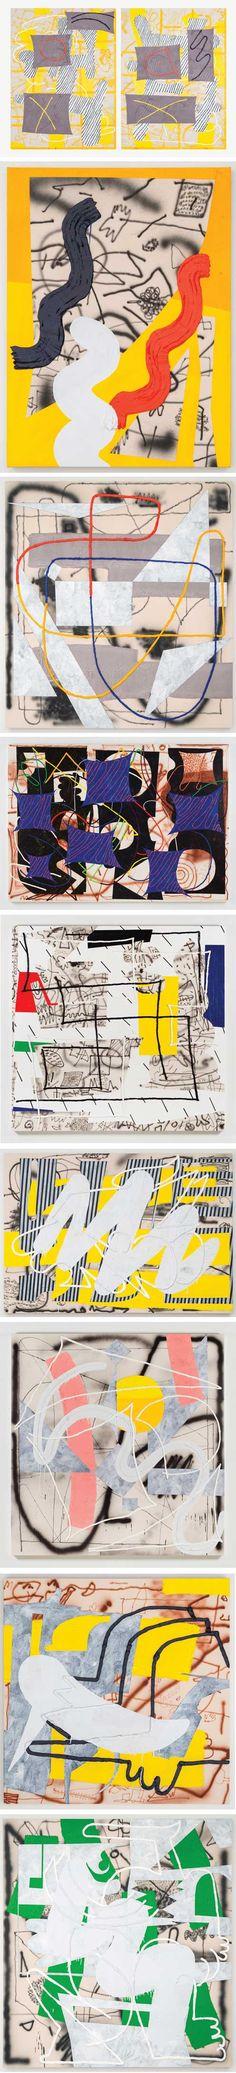 The work of Trudy Benson | http://blog.littlepaperplanes.com/trudy-benson/